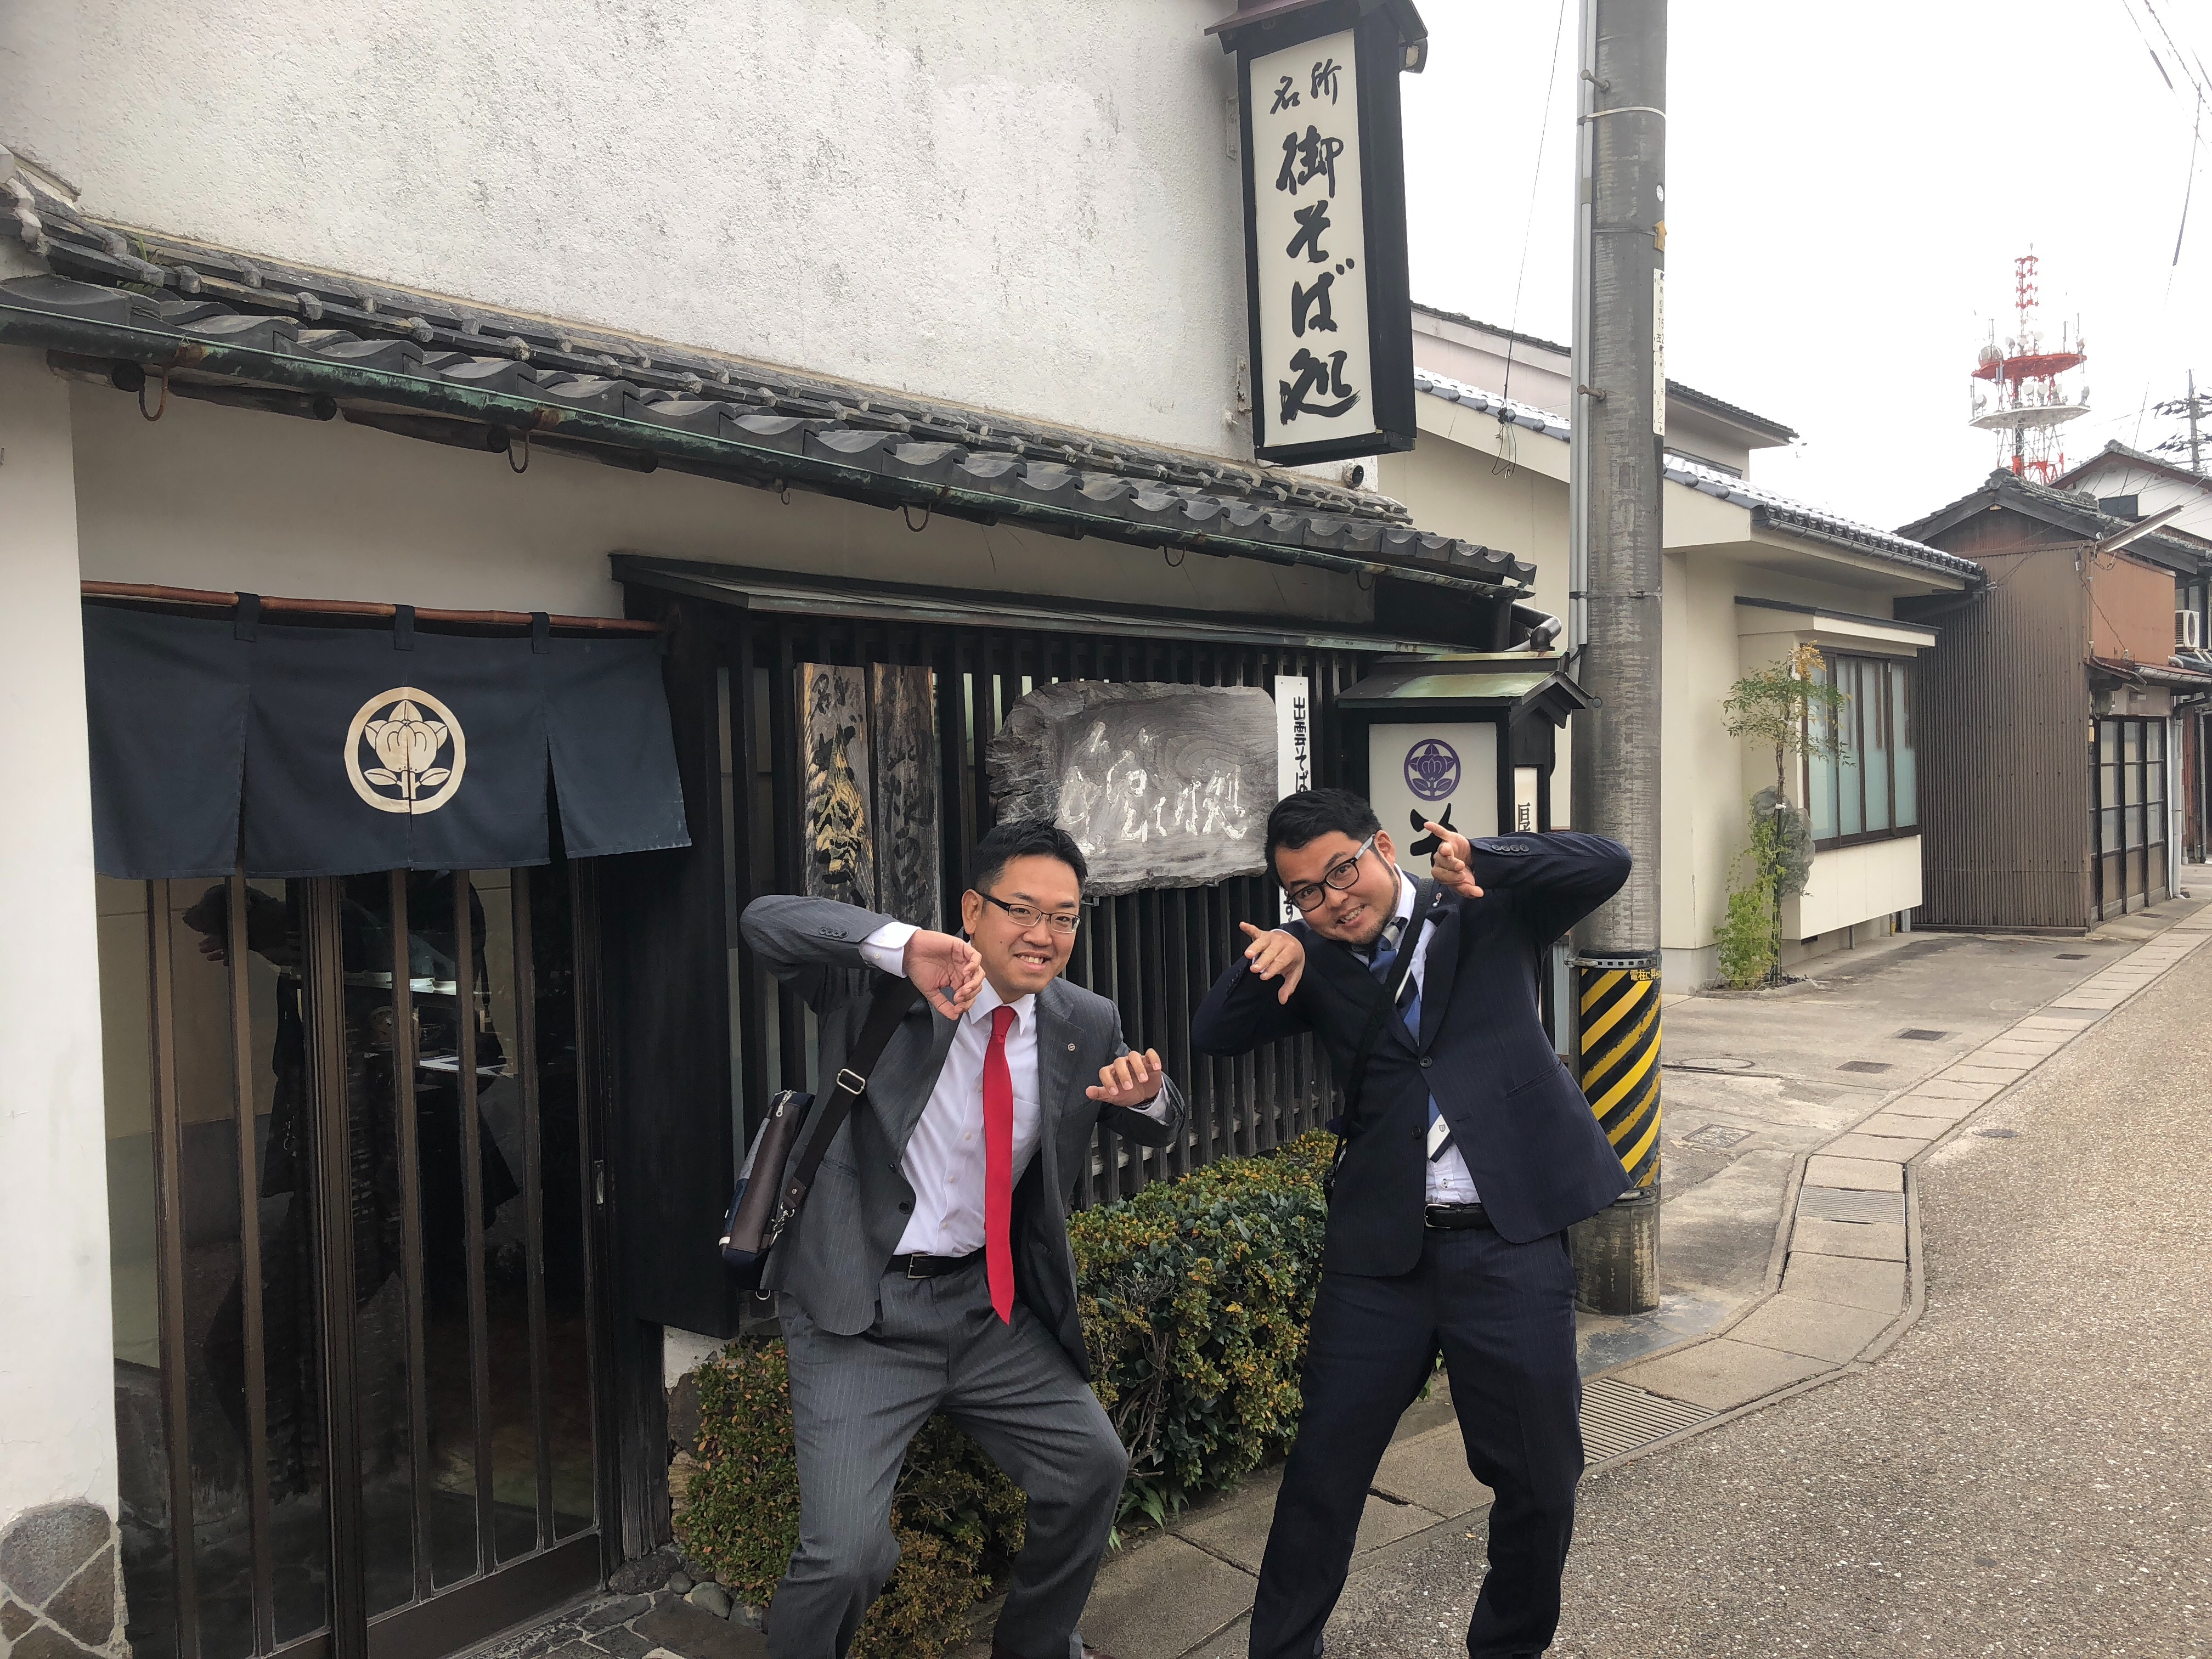 f:id:masanori-kato1972:20190327181325j:image